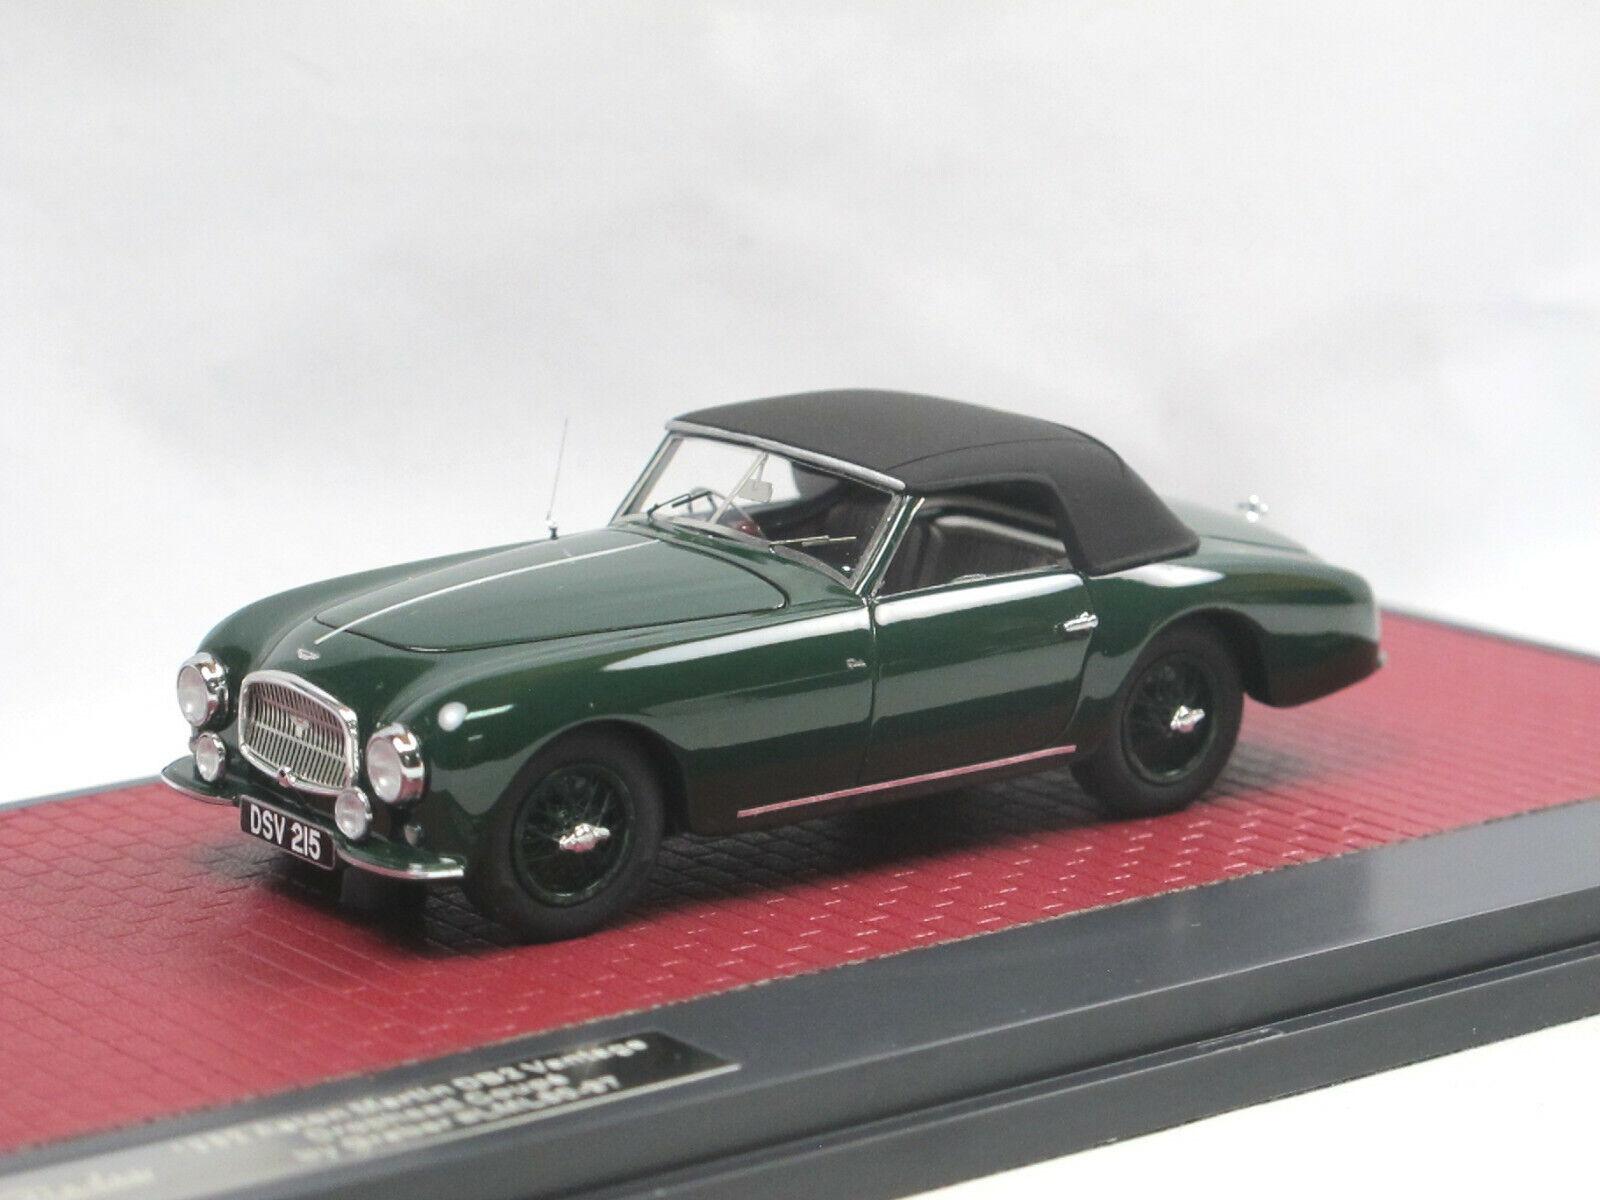 Matrix Scale Models 1952 Aston Martin DB2 Vantage DHC by Graber closed 1 43